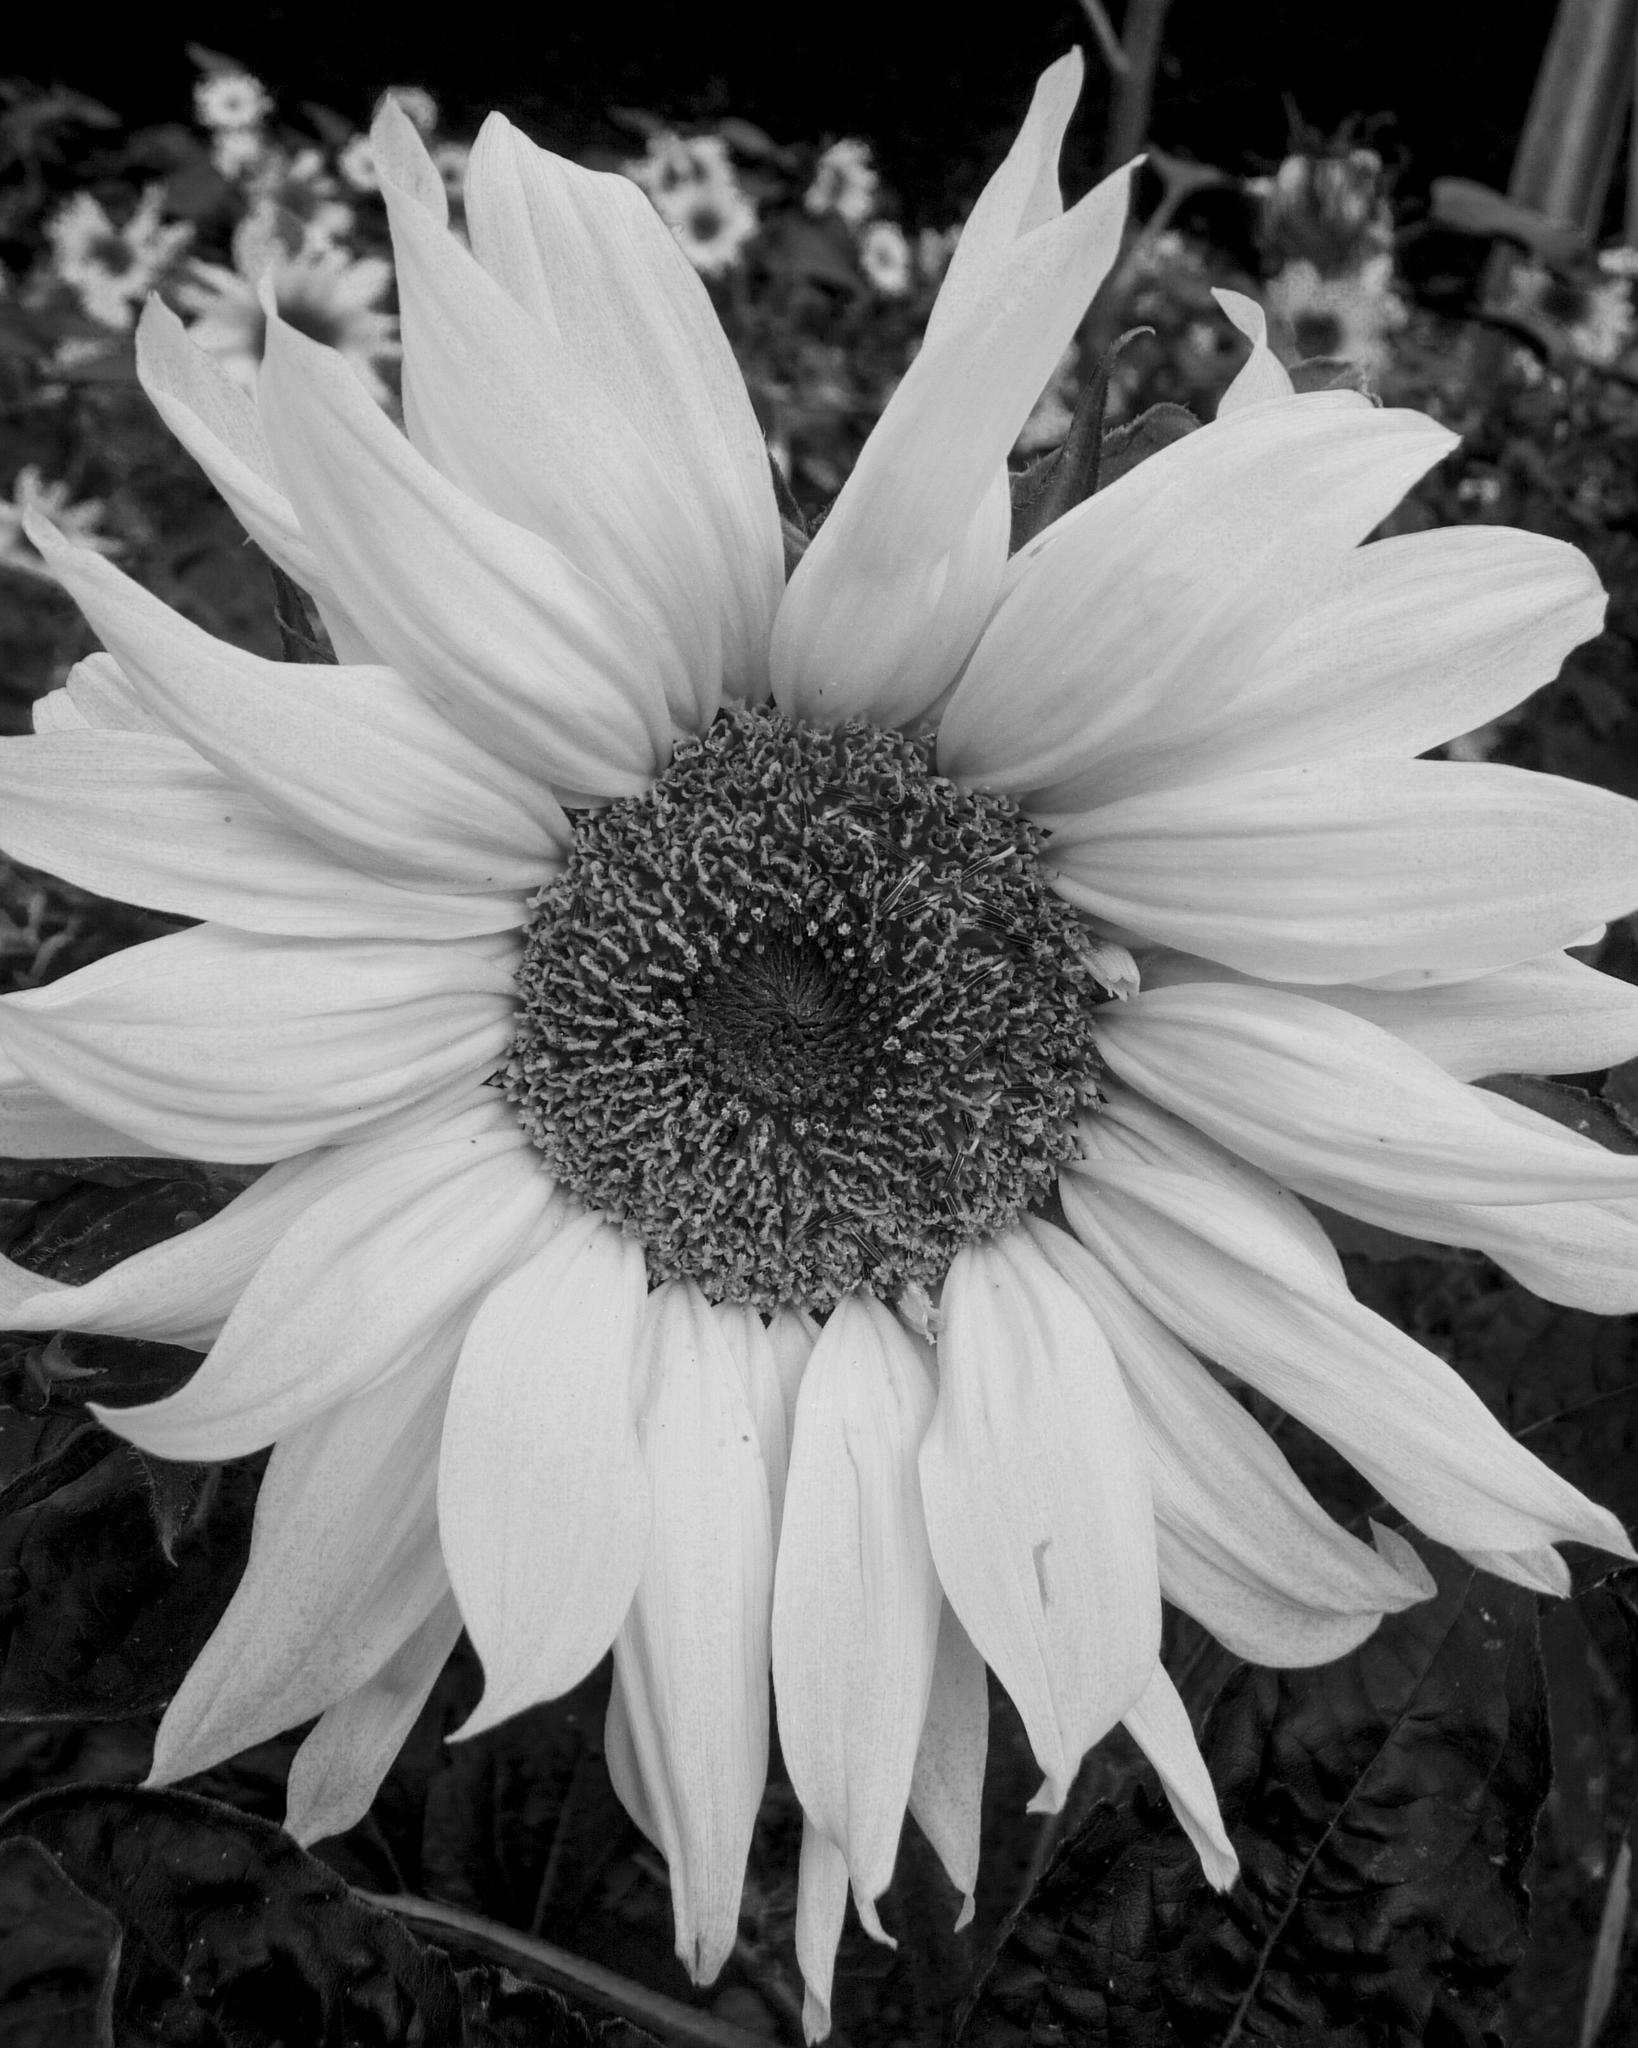 Sunflower by SteveH